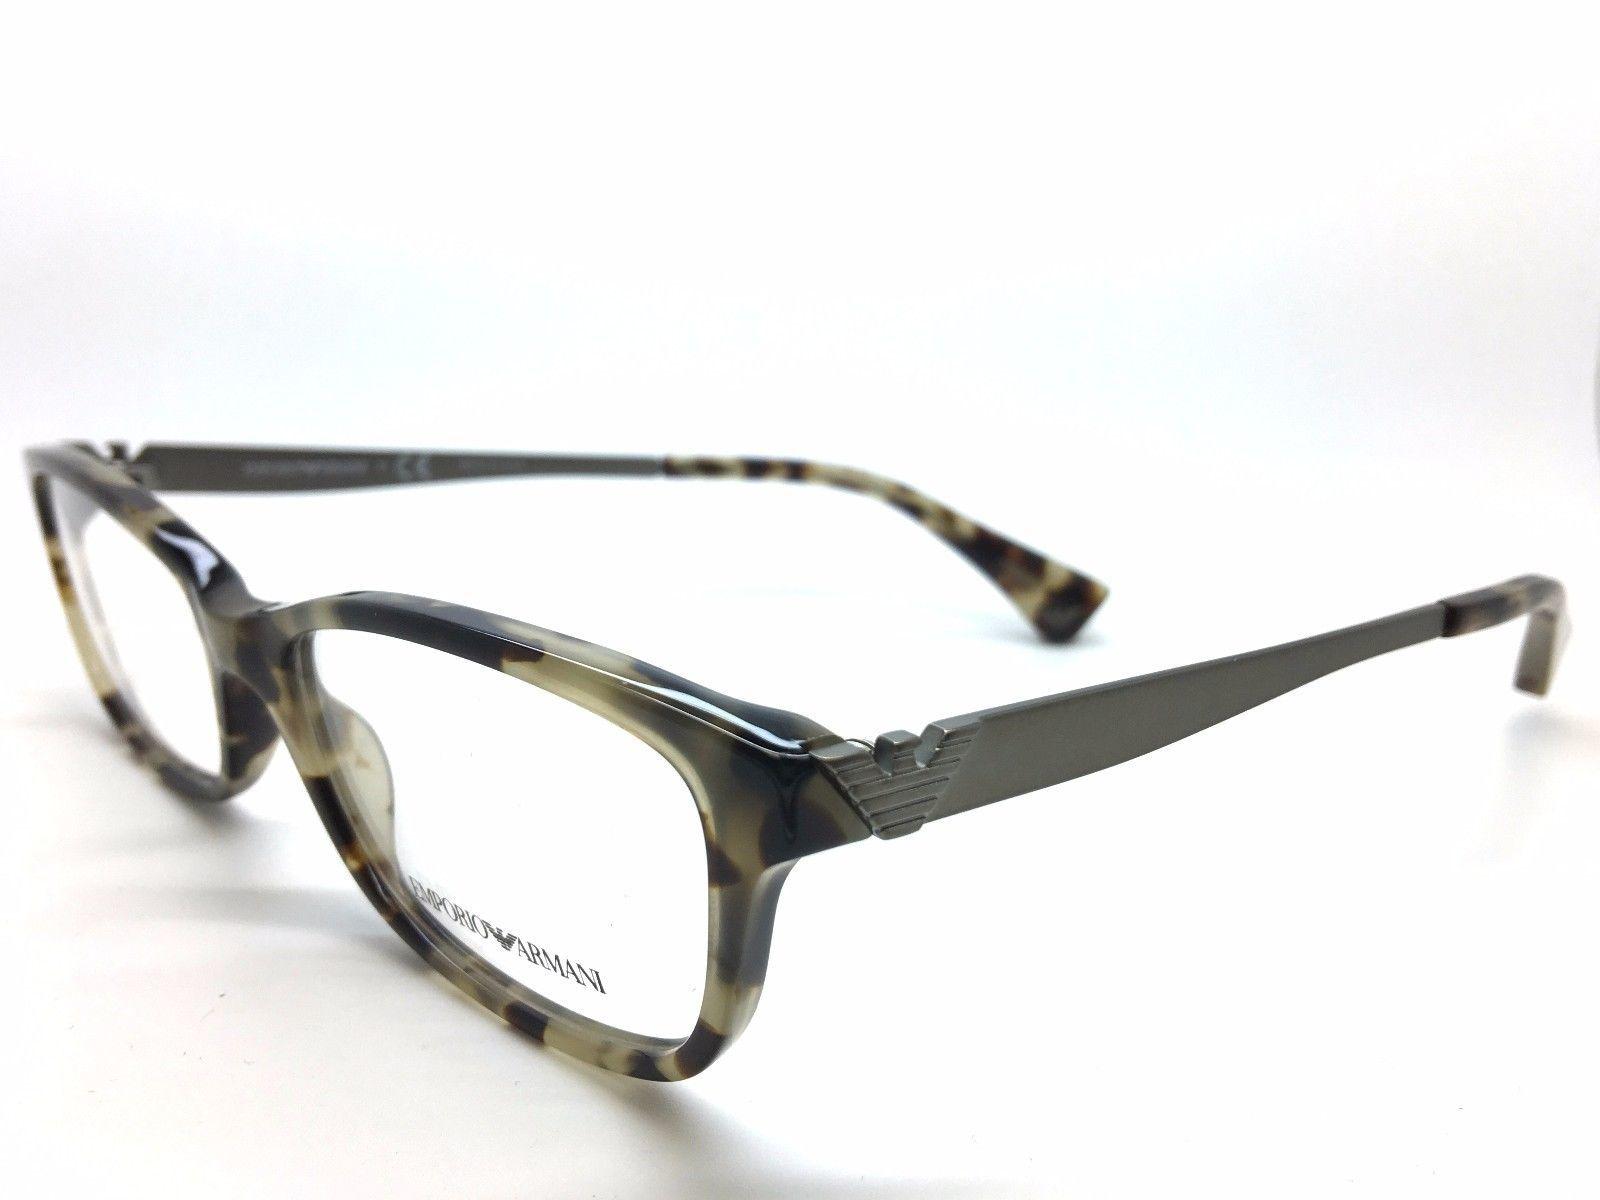 Emporio Armani Eyeglass Frame: 45 listings